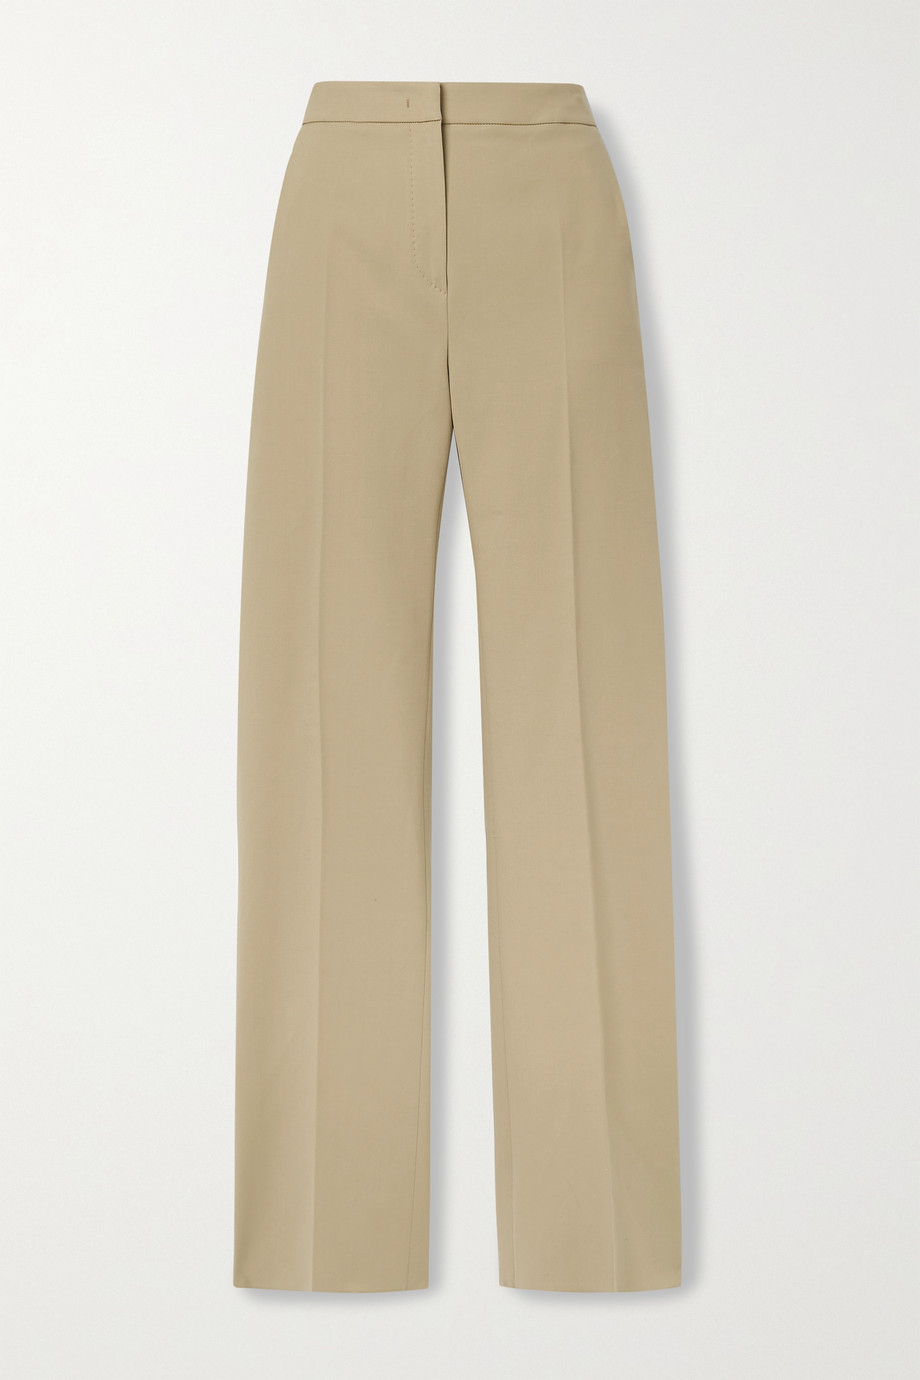 Max Mara Antares stretch-cotton straight-leg pants